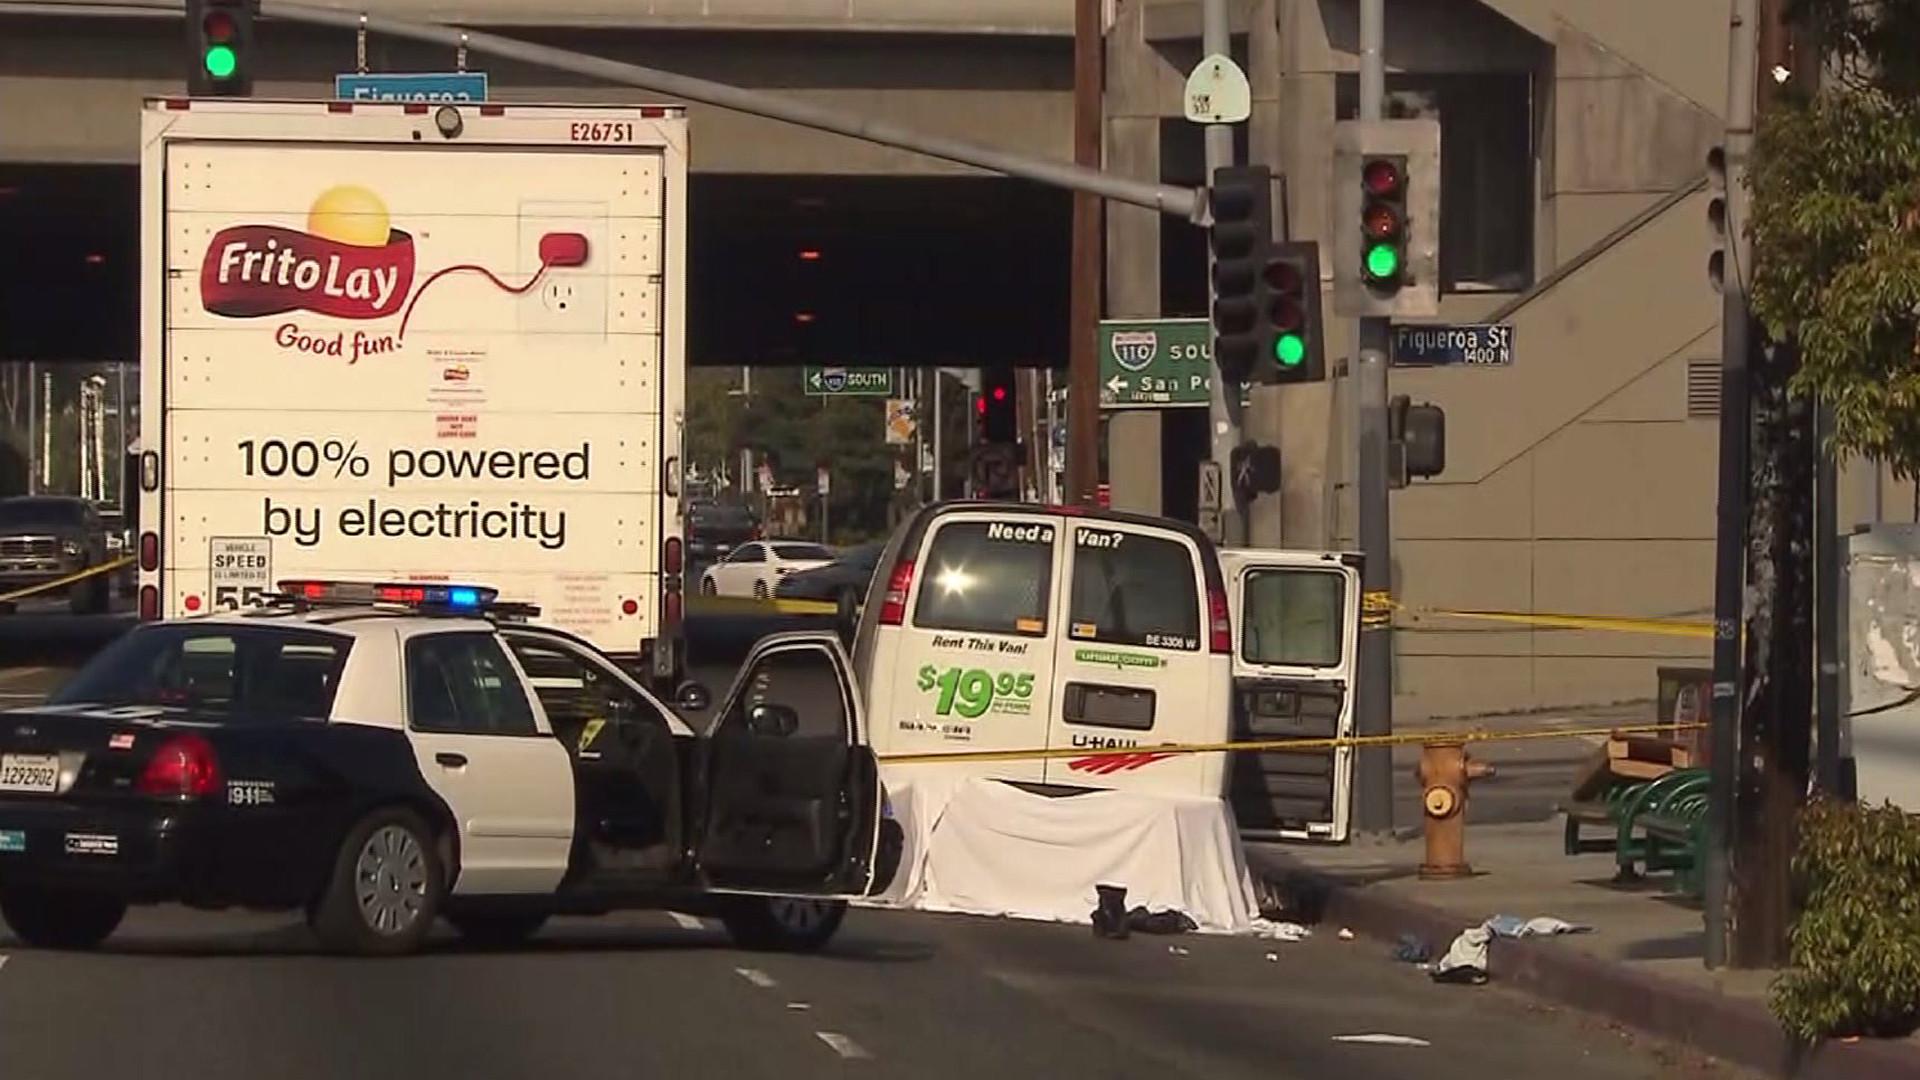 Robbery suspect dies after being dragged under U-Haul van